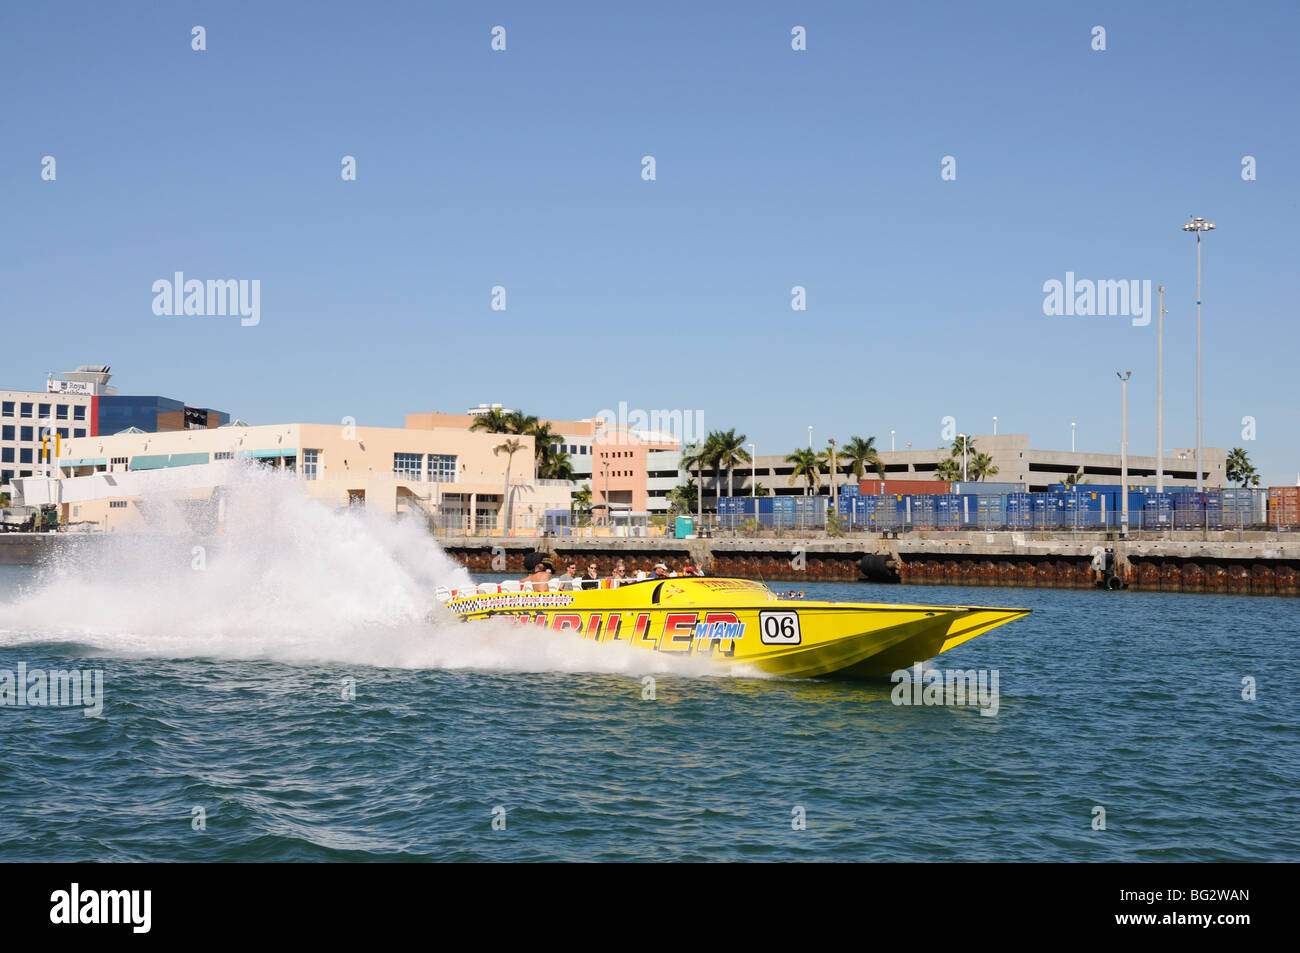 Tourists having fun in a speedboat, Miami Florida - Stock Image